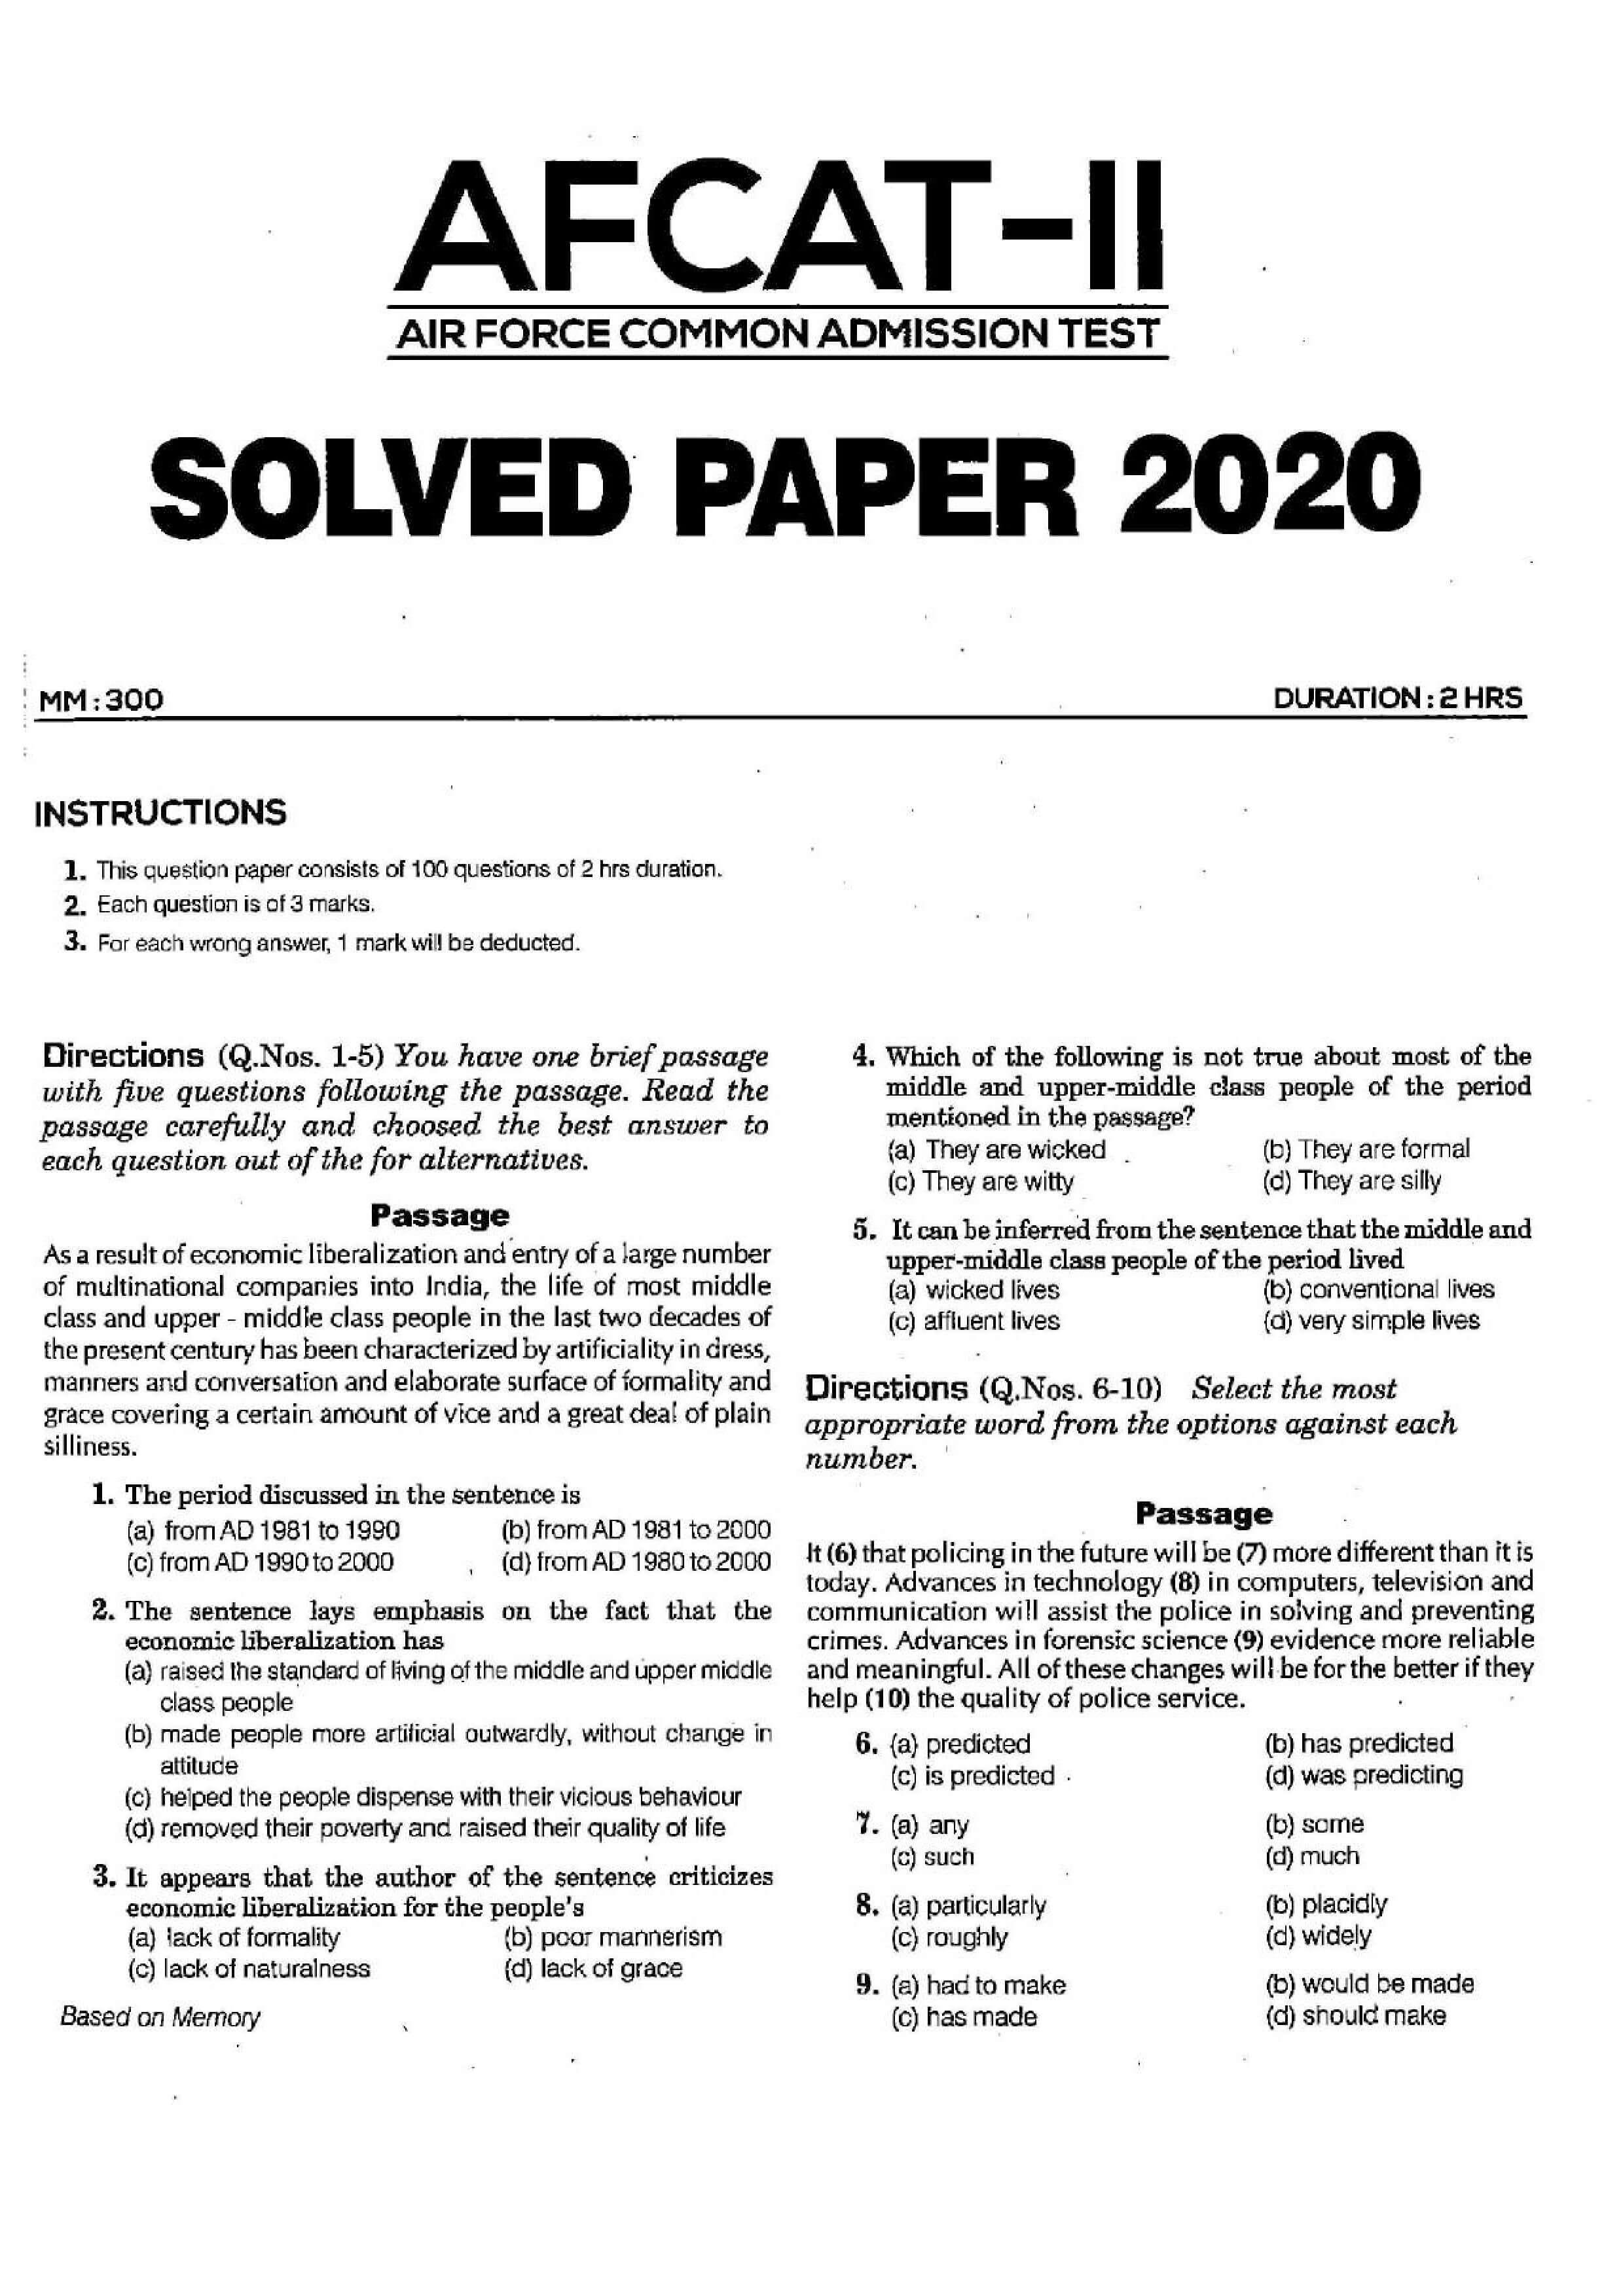 AFCAT 2 2020 Question Paper 01